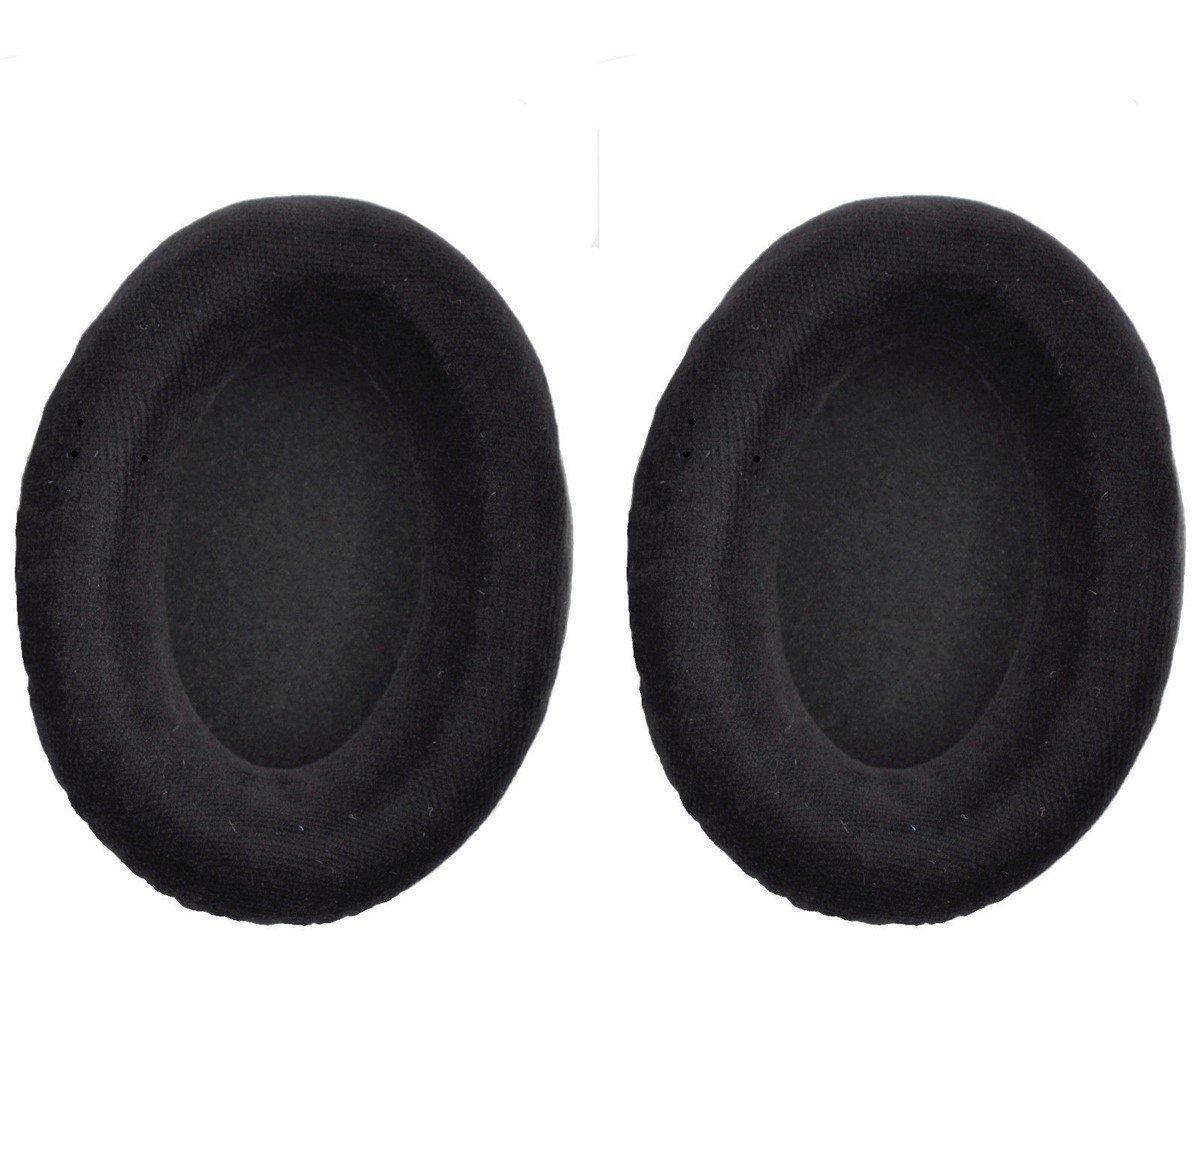 Genuine Replacement Ear Pads Cushions for SENNHEISER HD650, HD600, HD580, HD660 S, HD565, HD545 Headphones